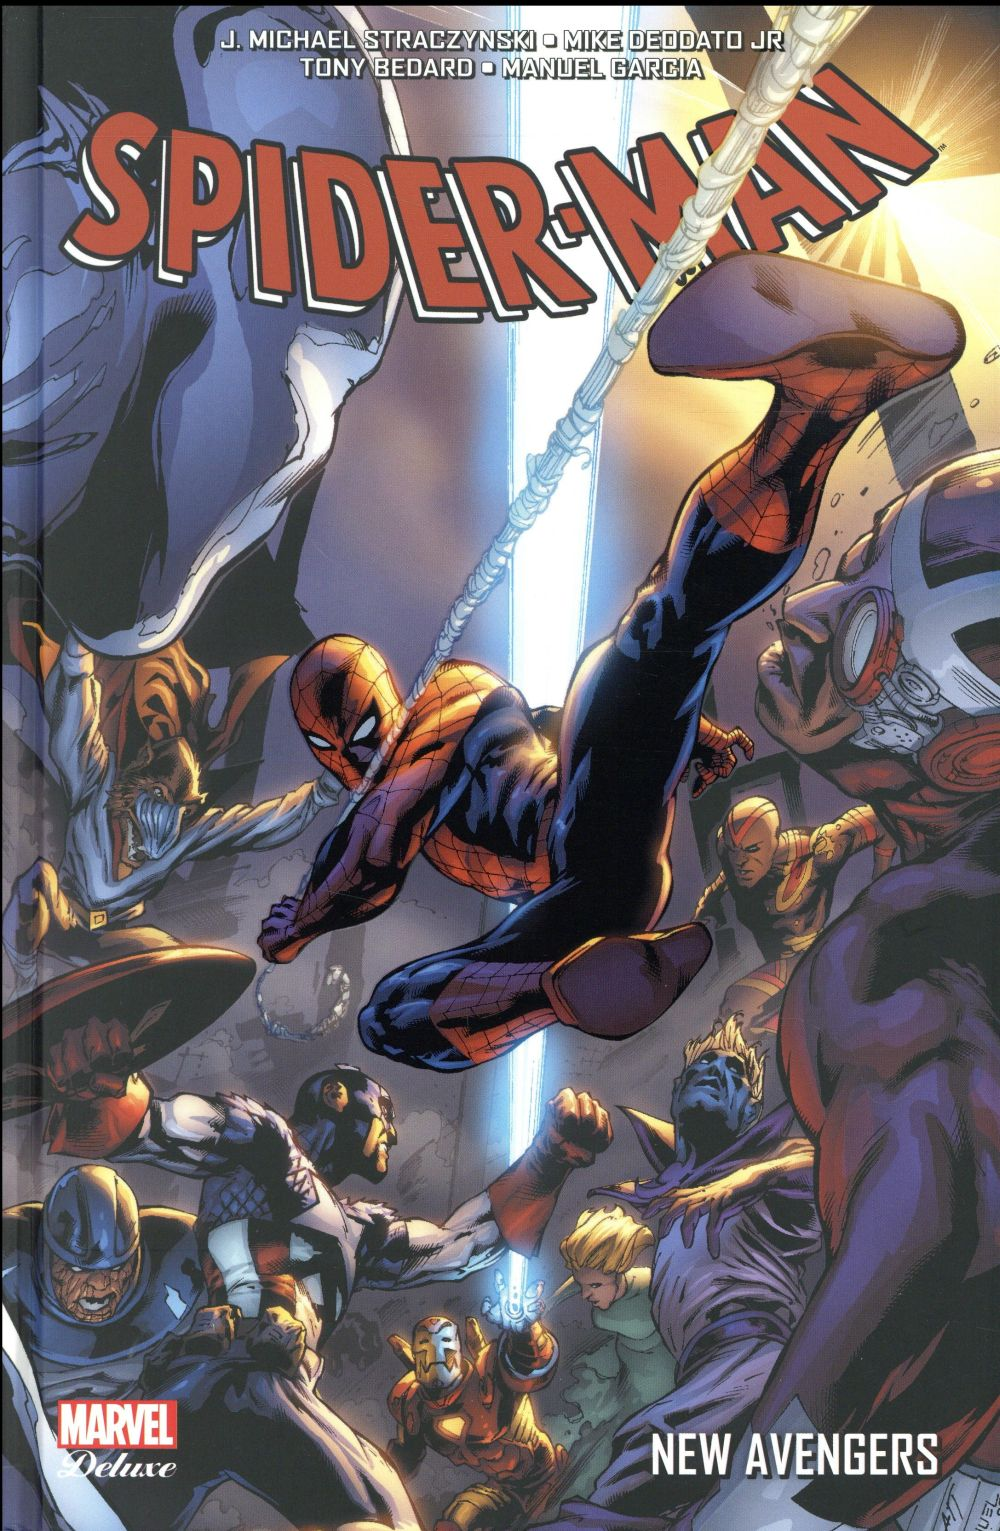 AMAZING SPIDER-MAN : NEW AVENGERS